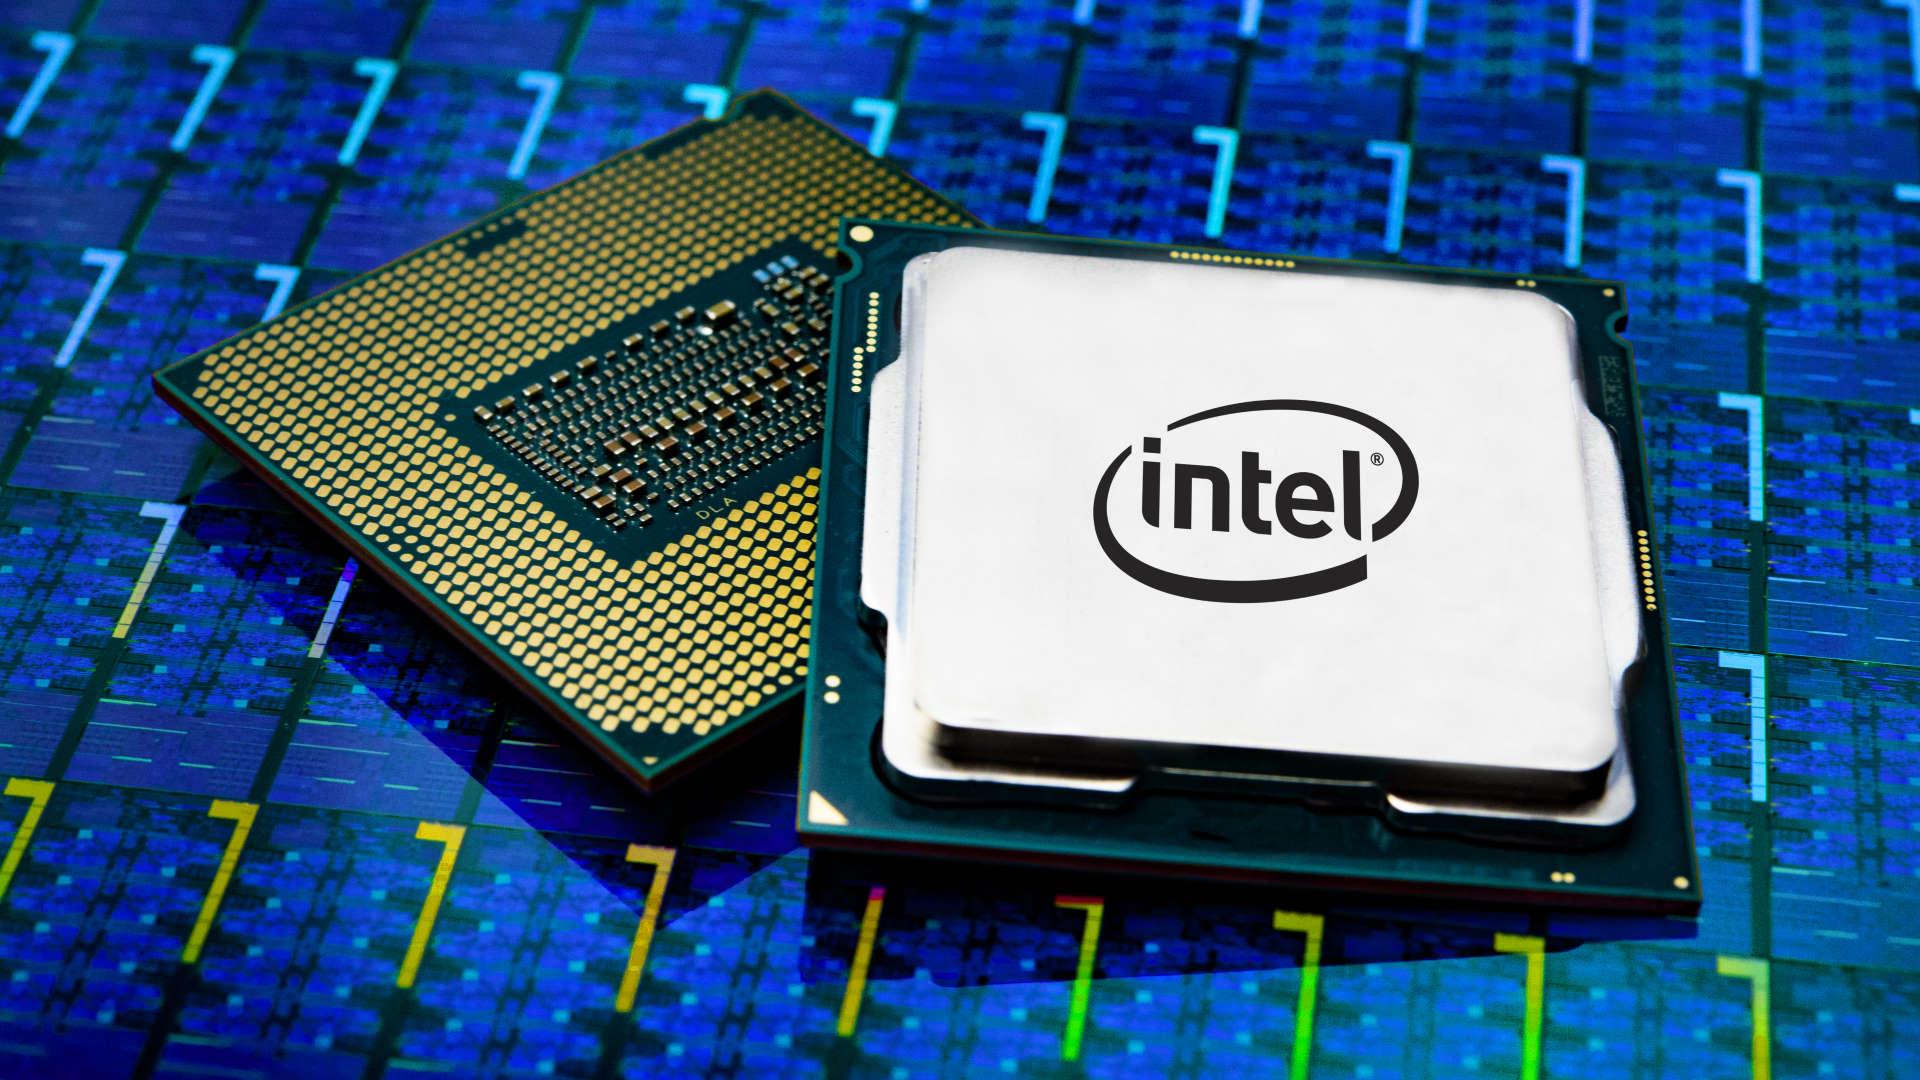 Intel's new Rocket Lake CPU is still 11% slower than AMD's top Ryzen 5000-series chip